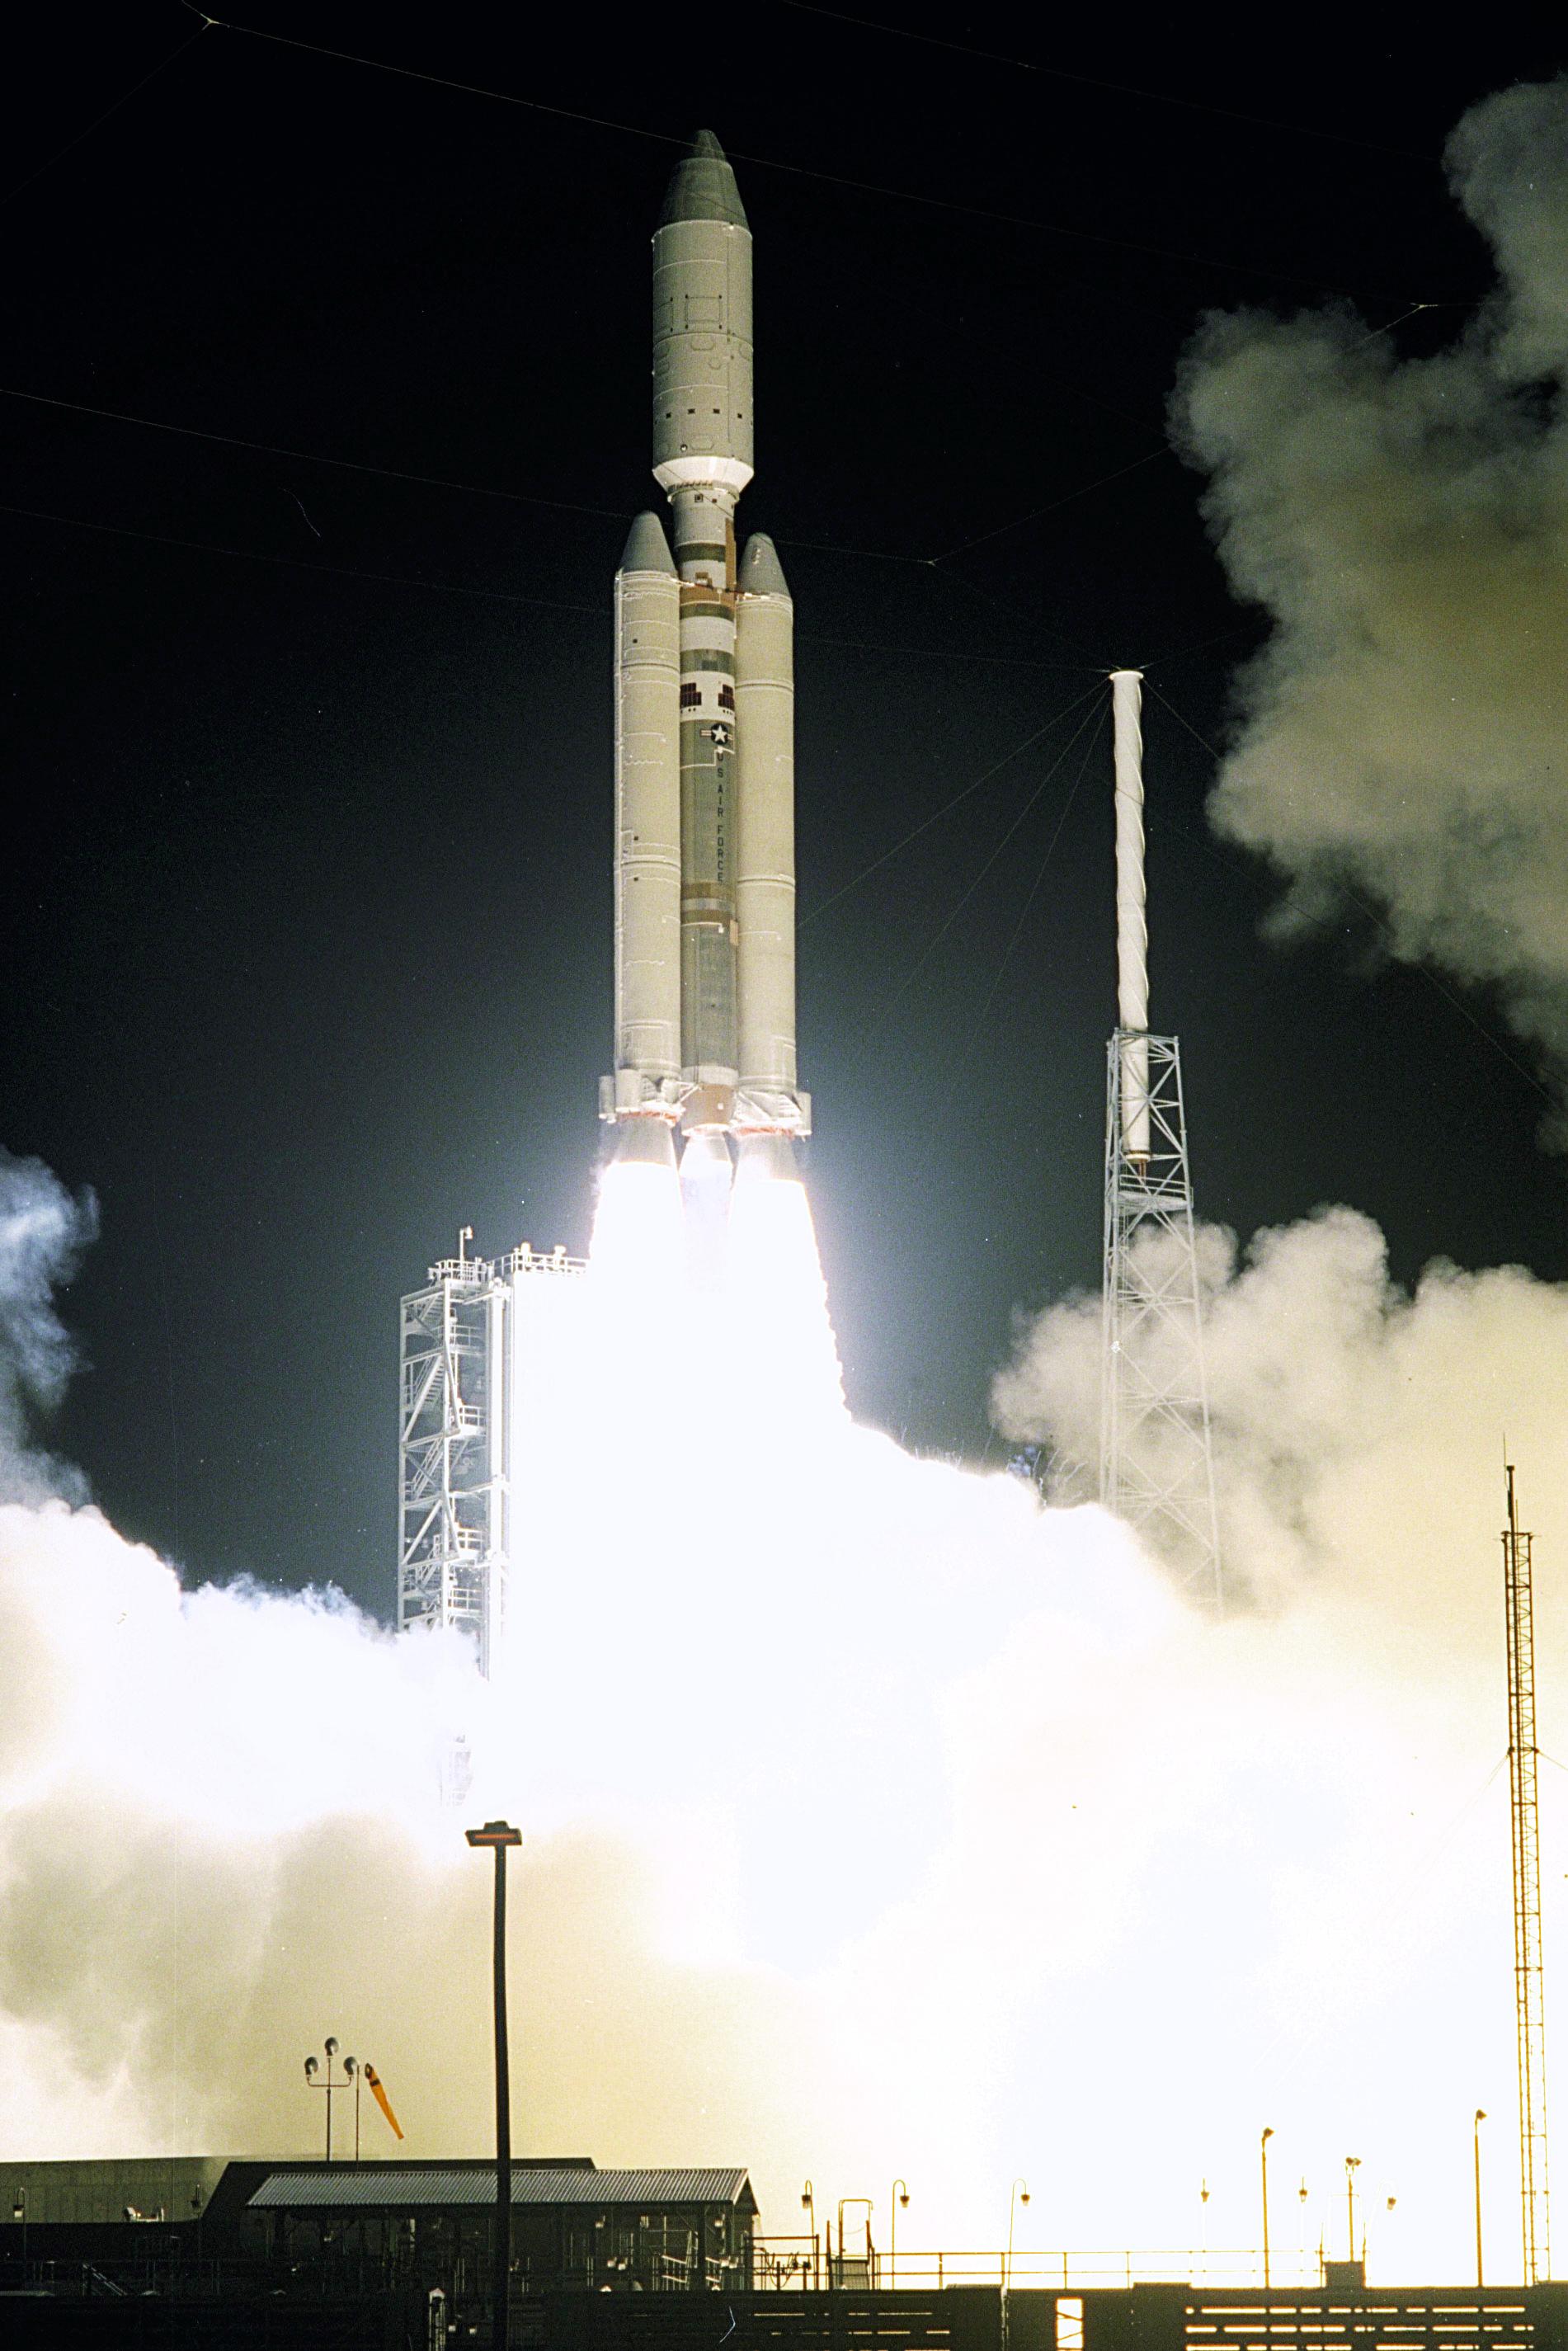 cassini probe launch - photo #1